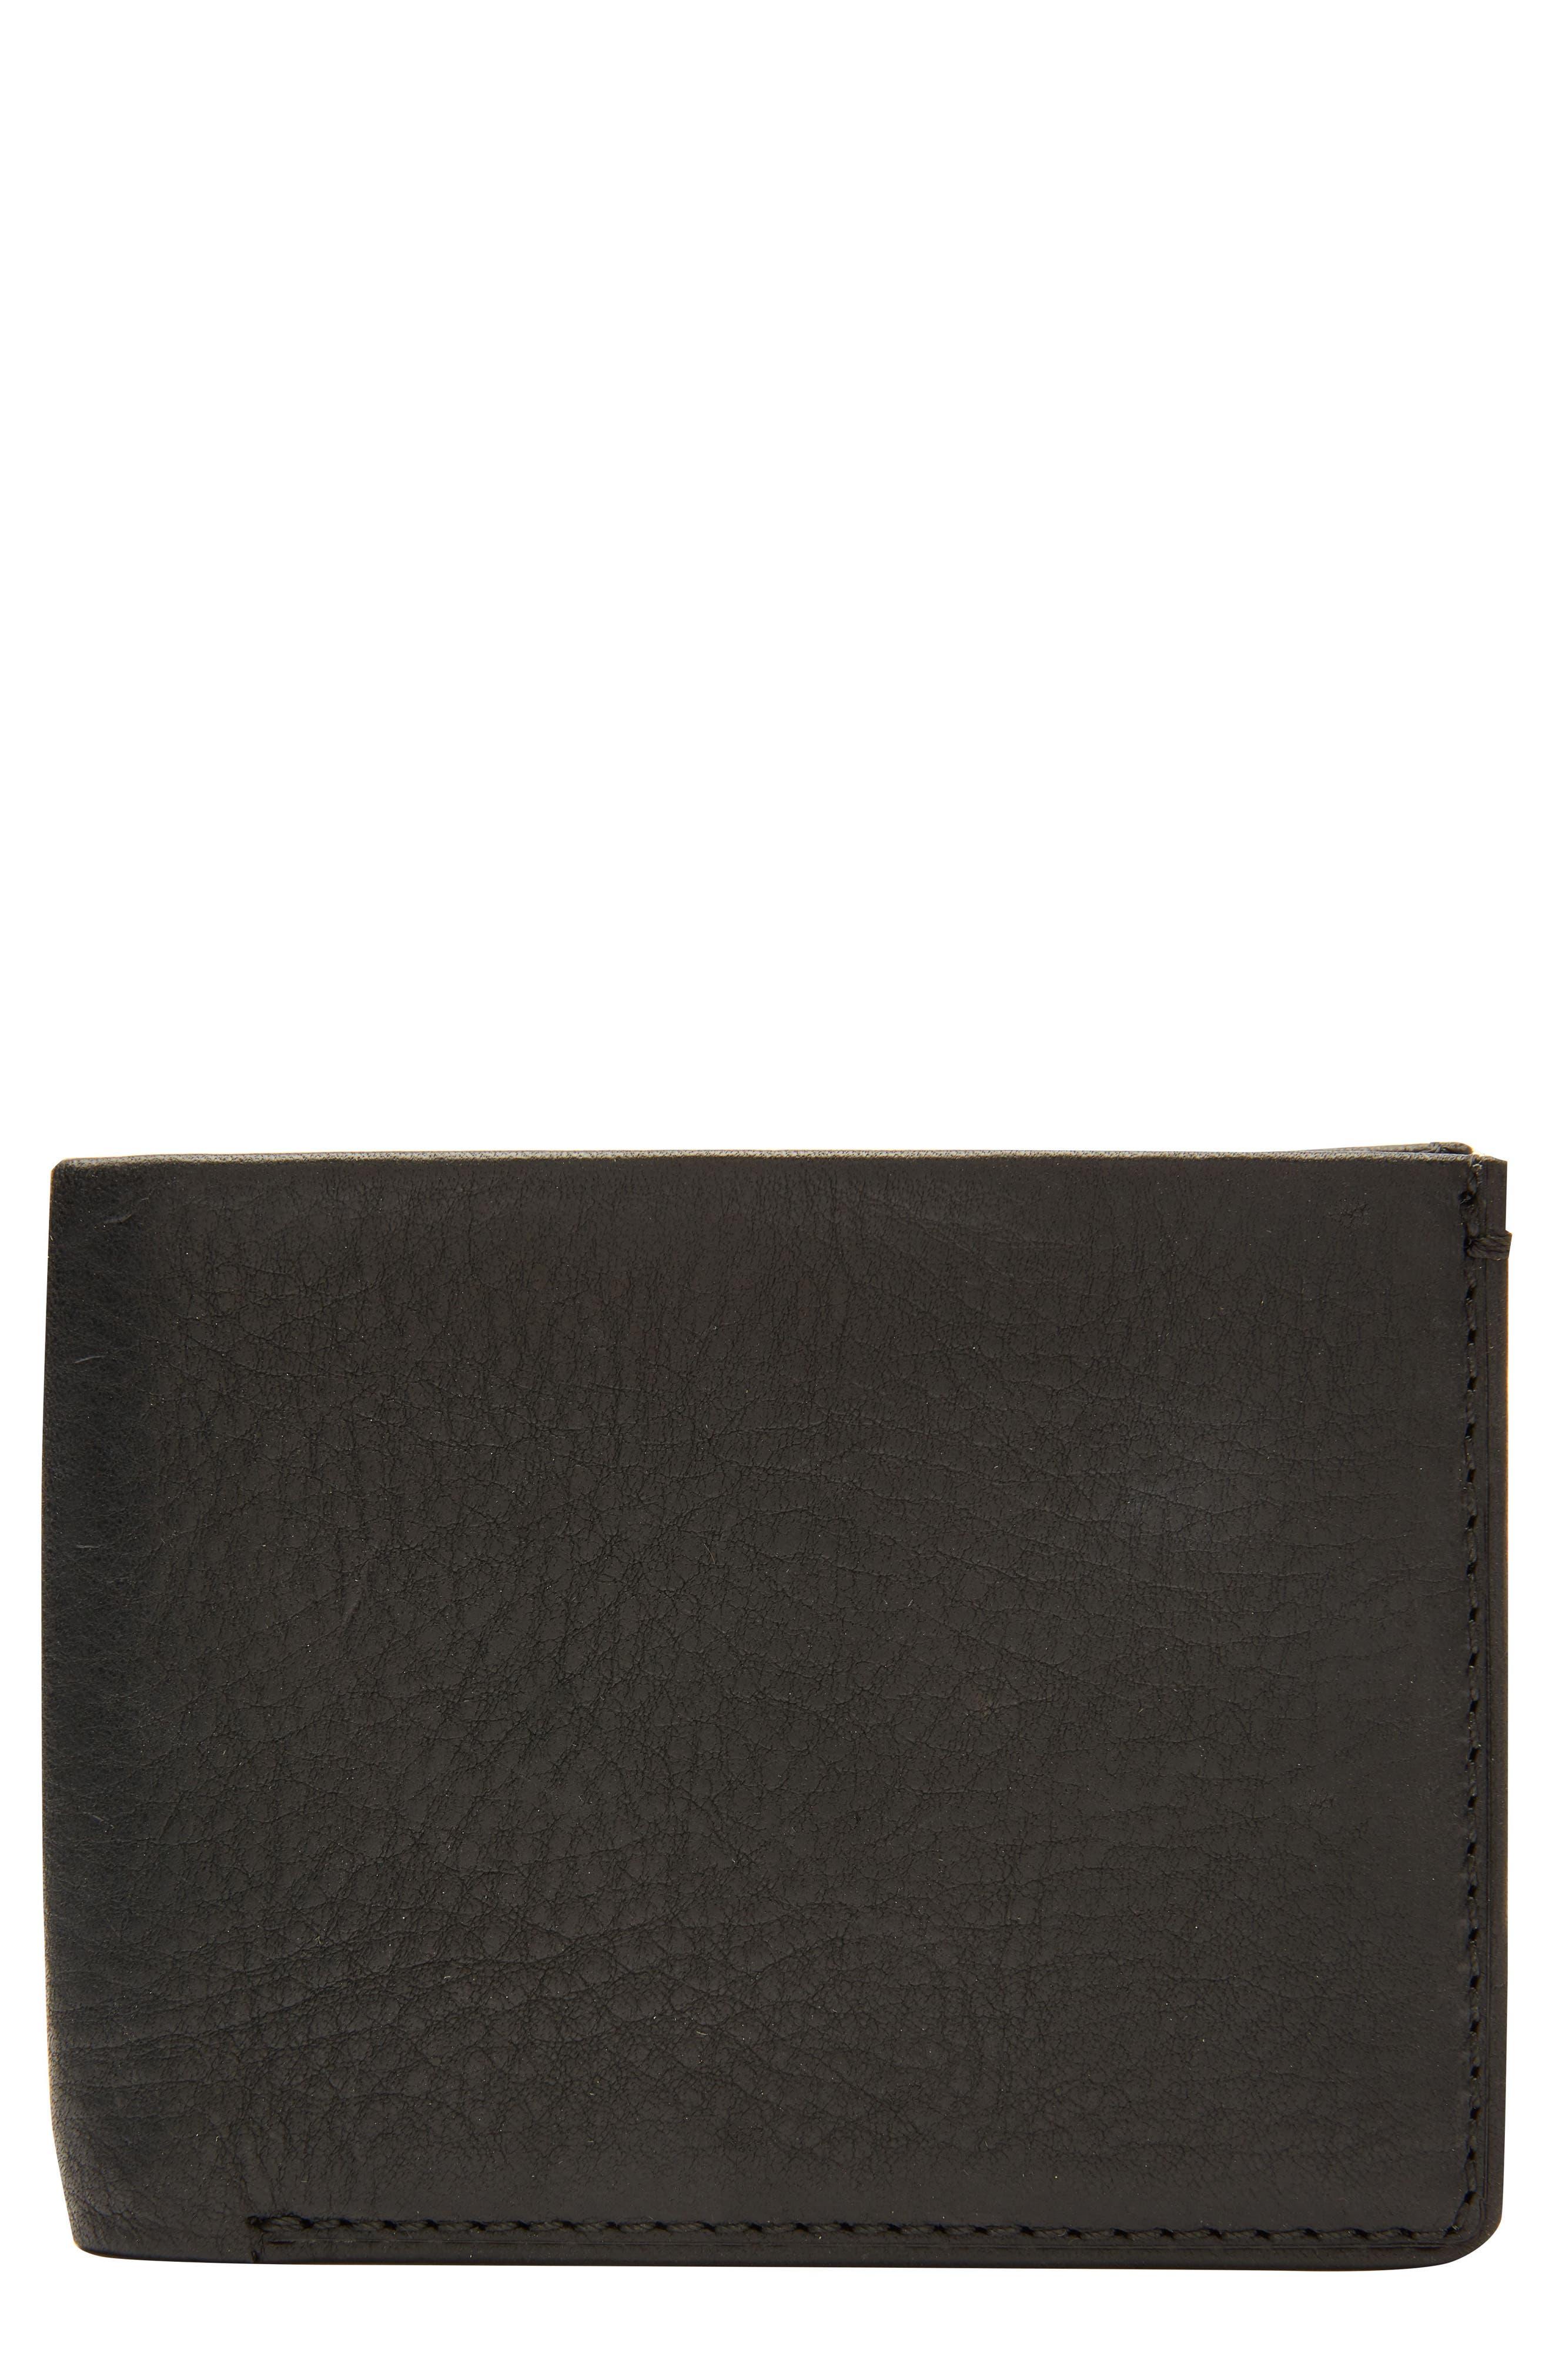 Selvedge Denim Wallet,                             Main thumbnail 1, color,                             Black